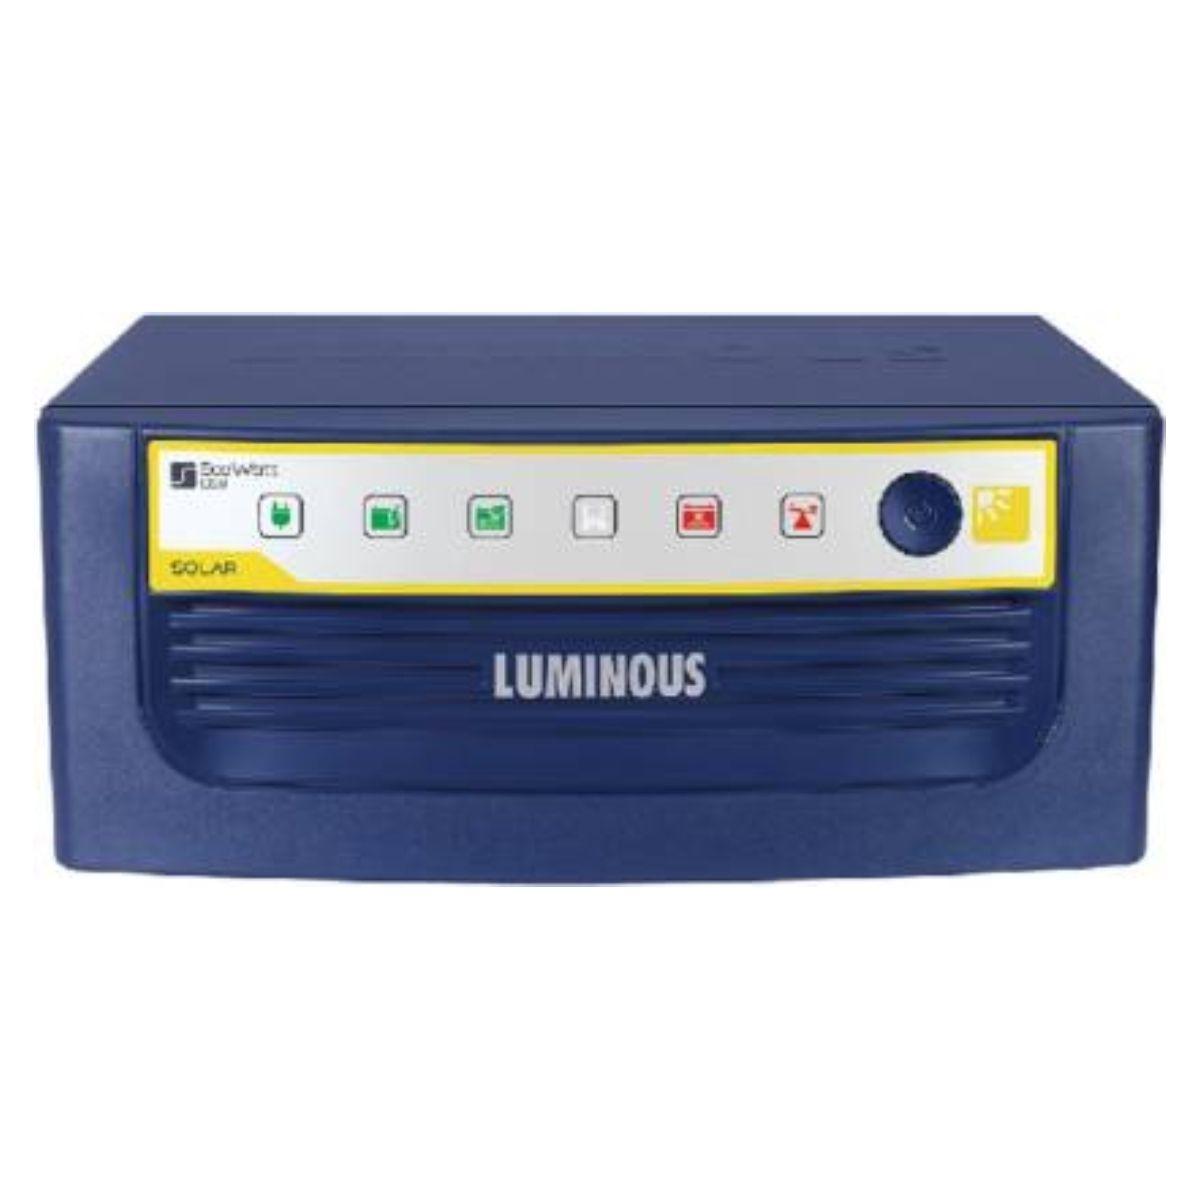 LUMINOUS EcoWatt Solar Square Wave Inverter